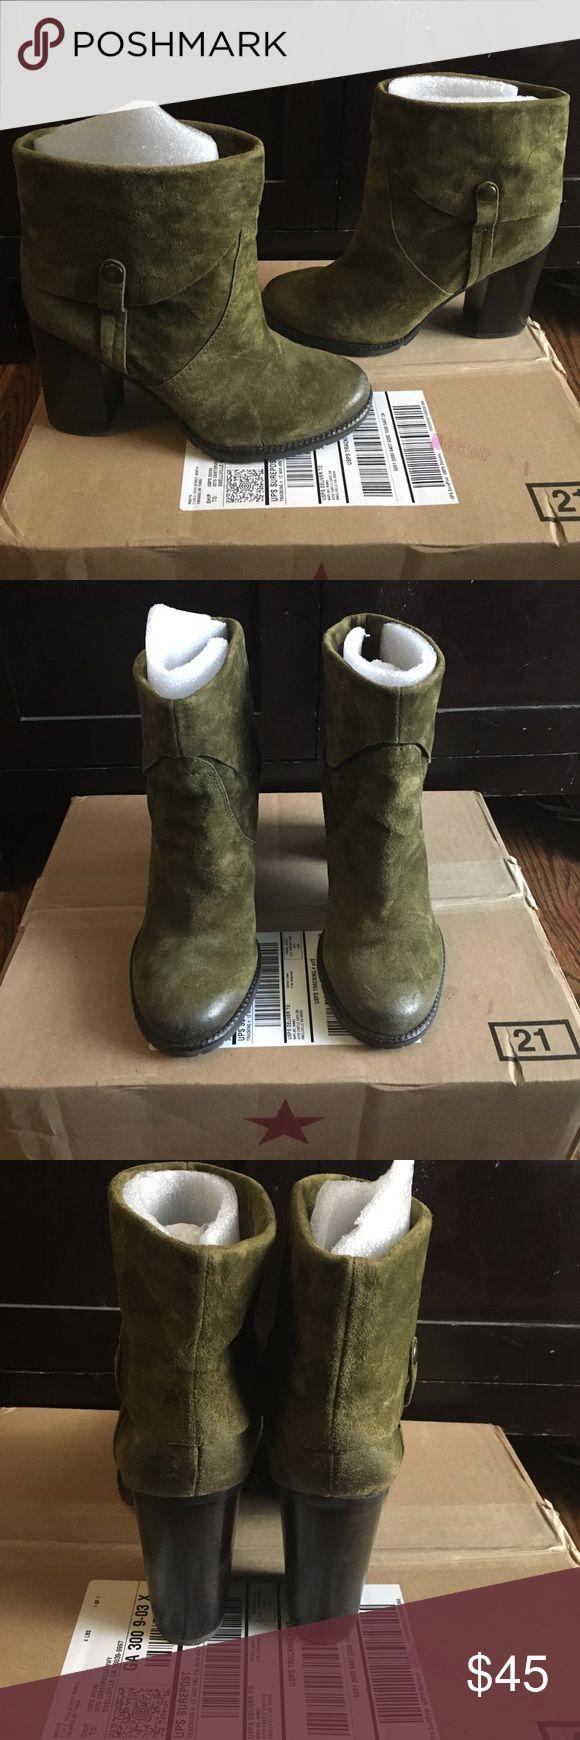 Franco Sarto boots Beautiful olive green Franco Sarto ankle boots Franco Sarto Shoes Ankle Boots & Booties